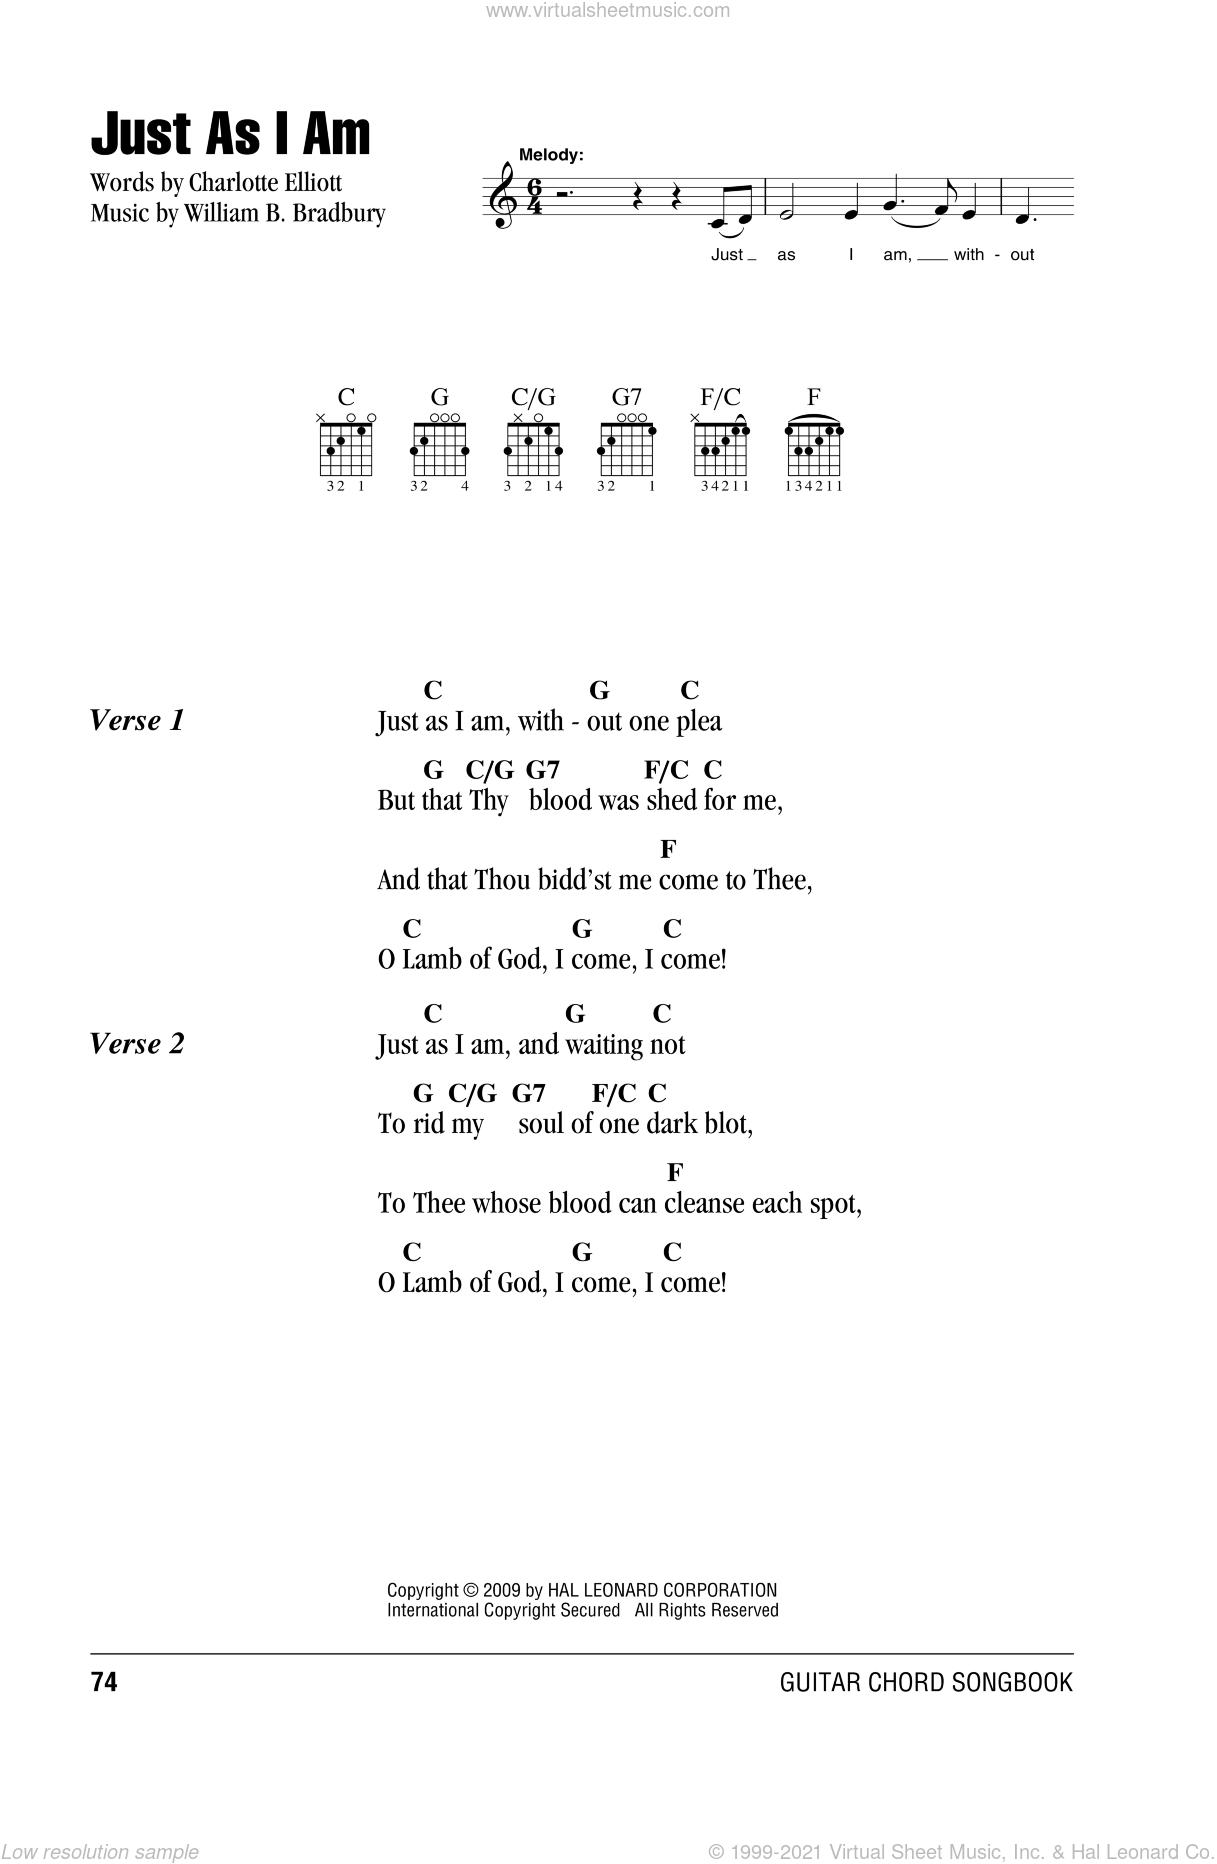 Just As I Am sheet music for guitar (chords) by Charlotte Elliott and William B. Bradbury, intermediate skill level